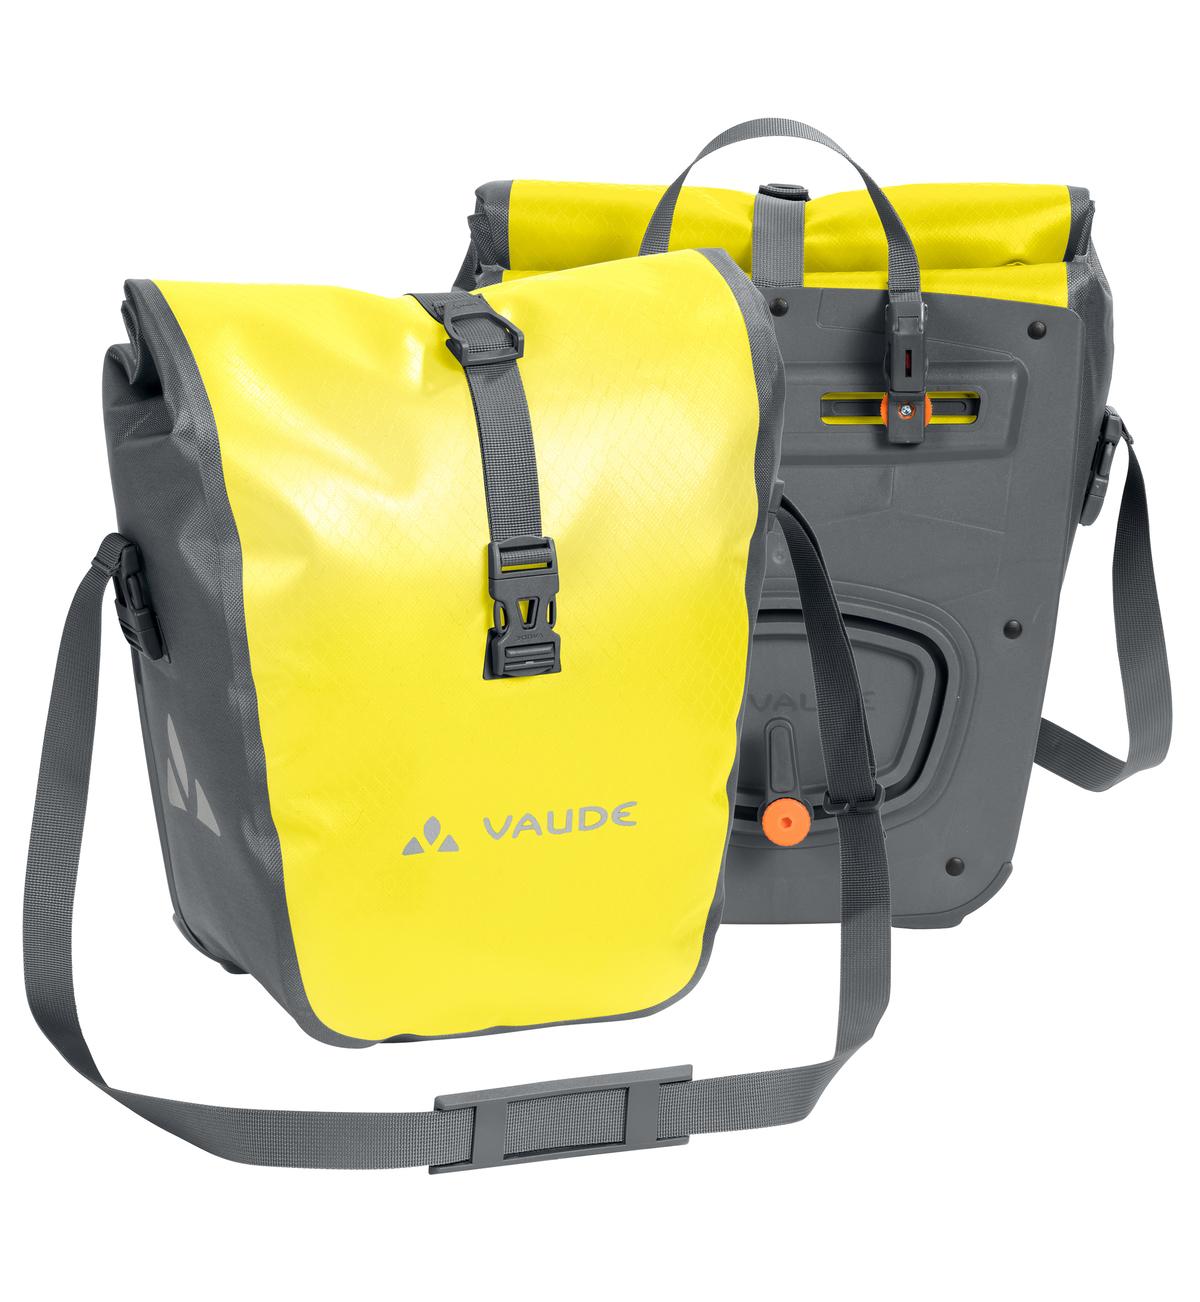 VAUDE Aqua Front canary  - 2-Rad-Sport Wehrle